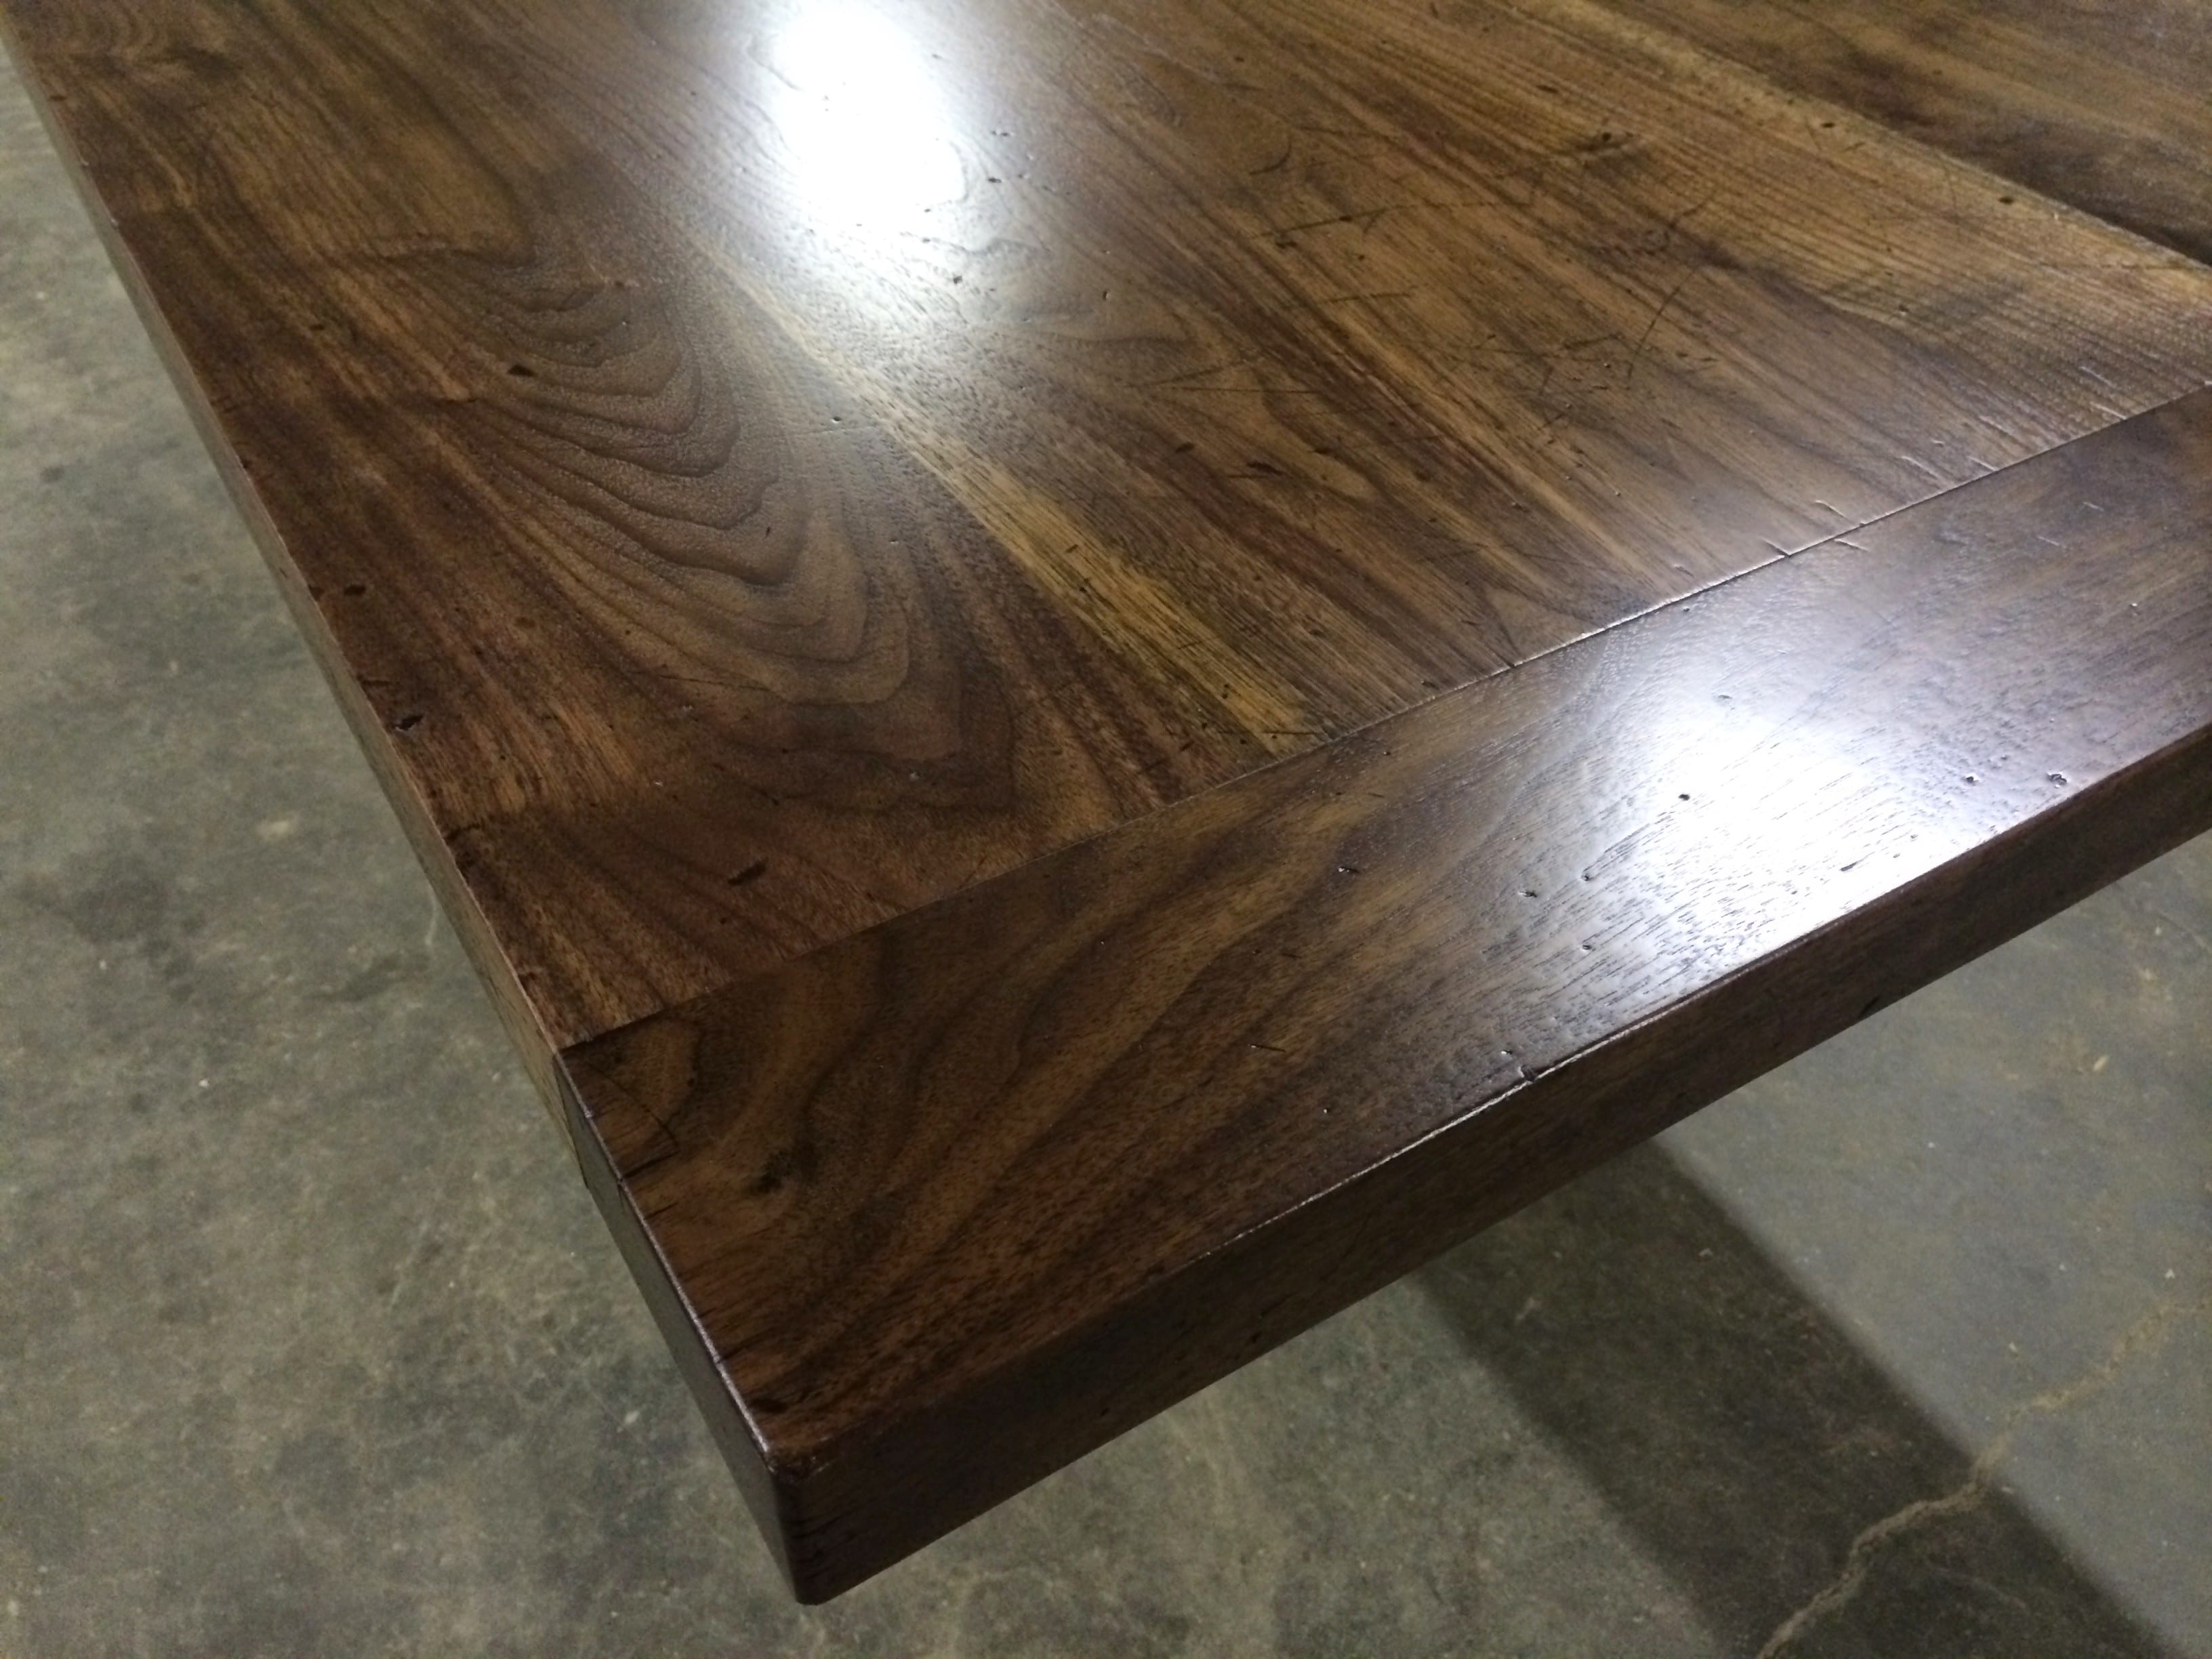 Breadboard End Table Top